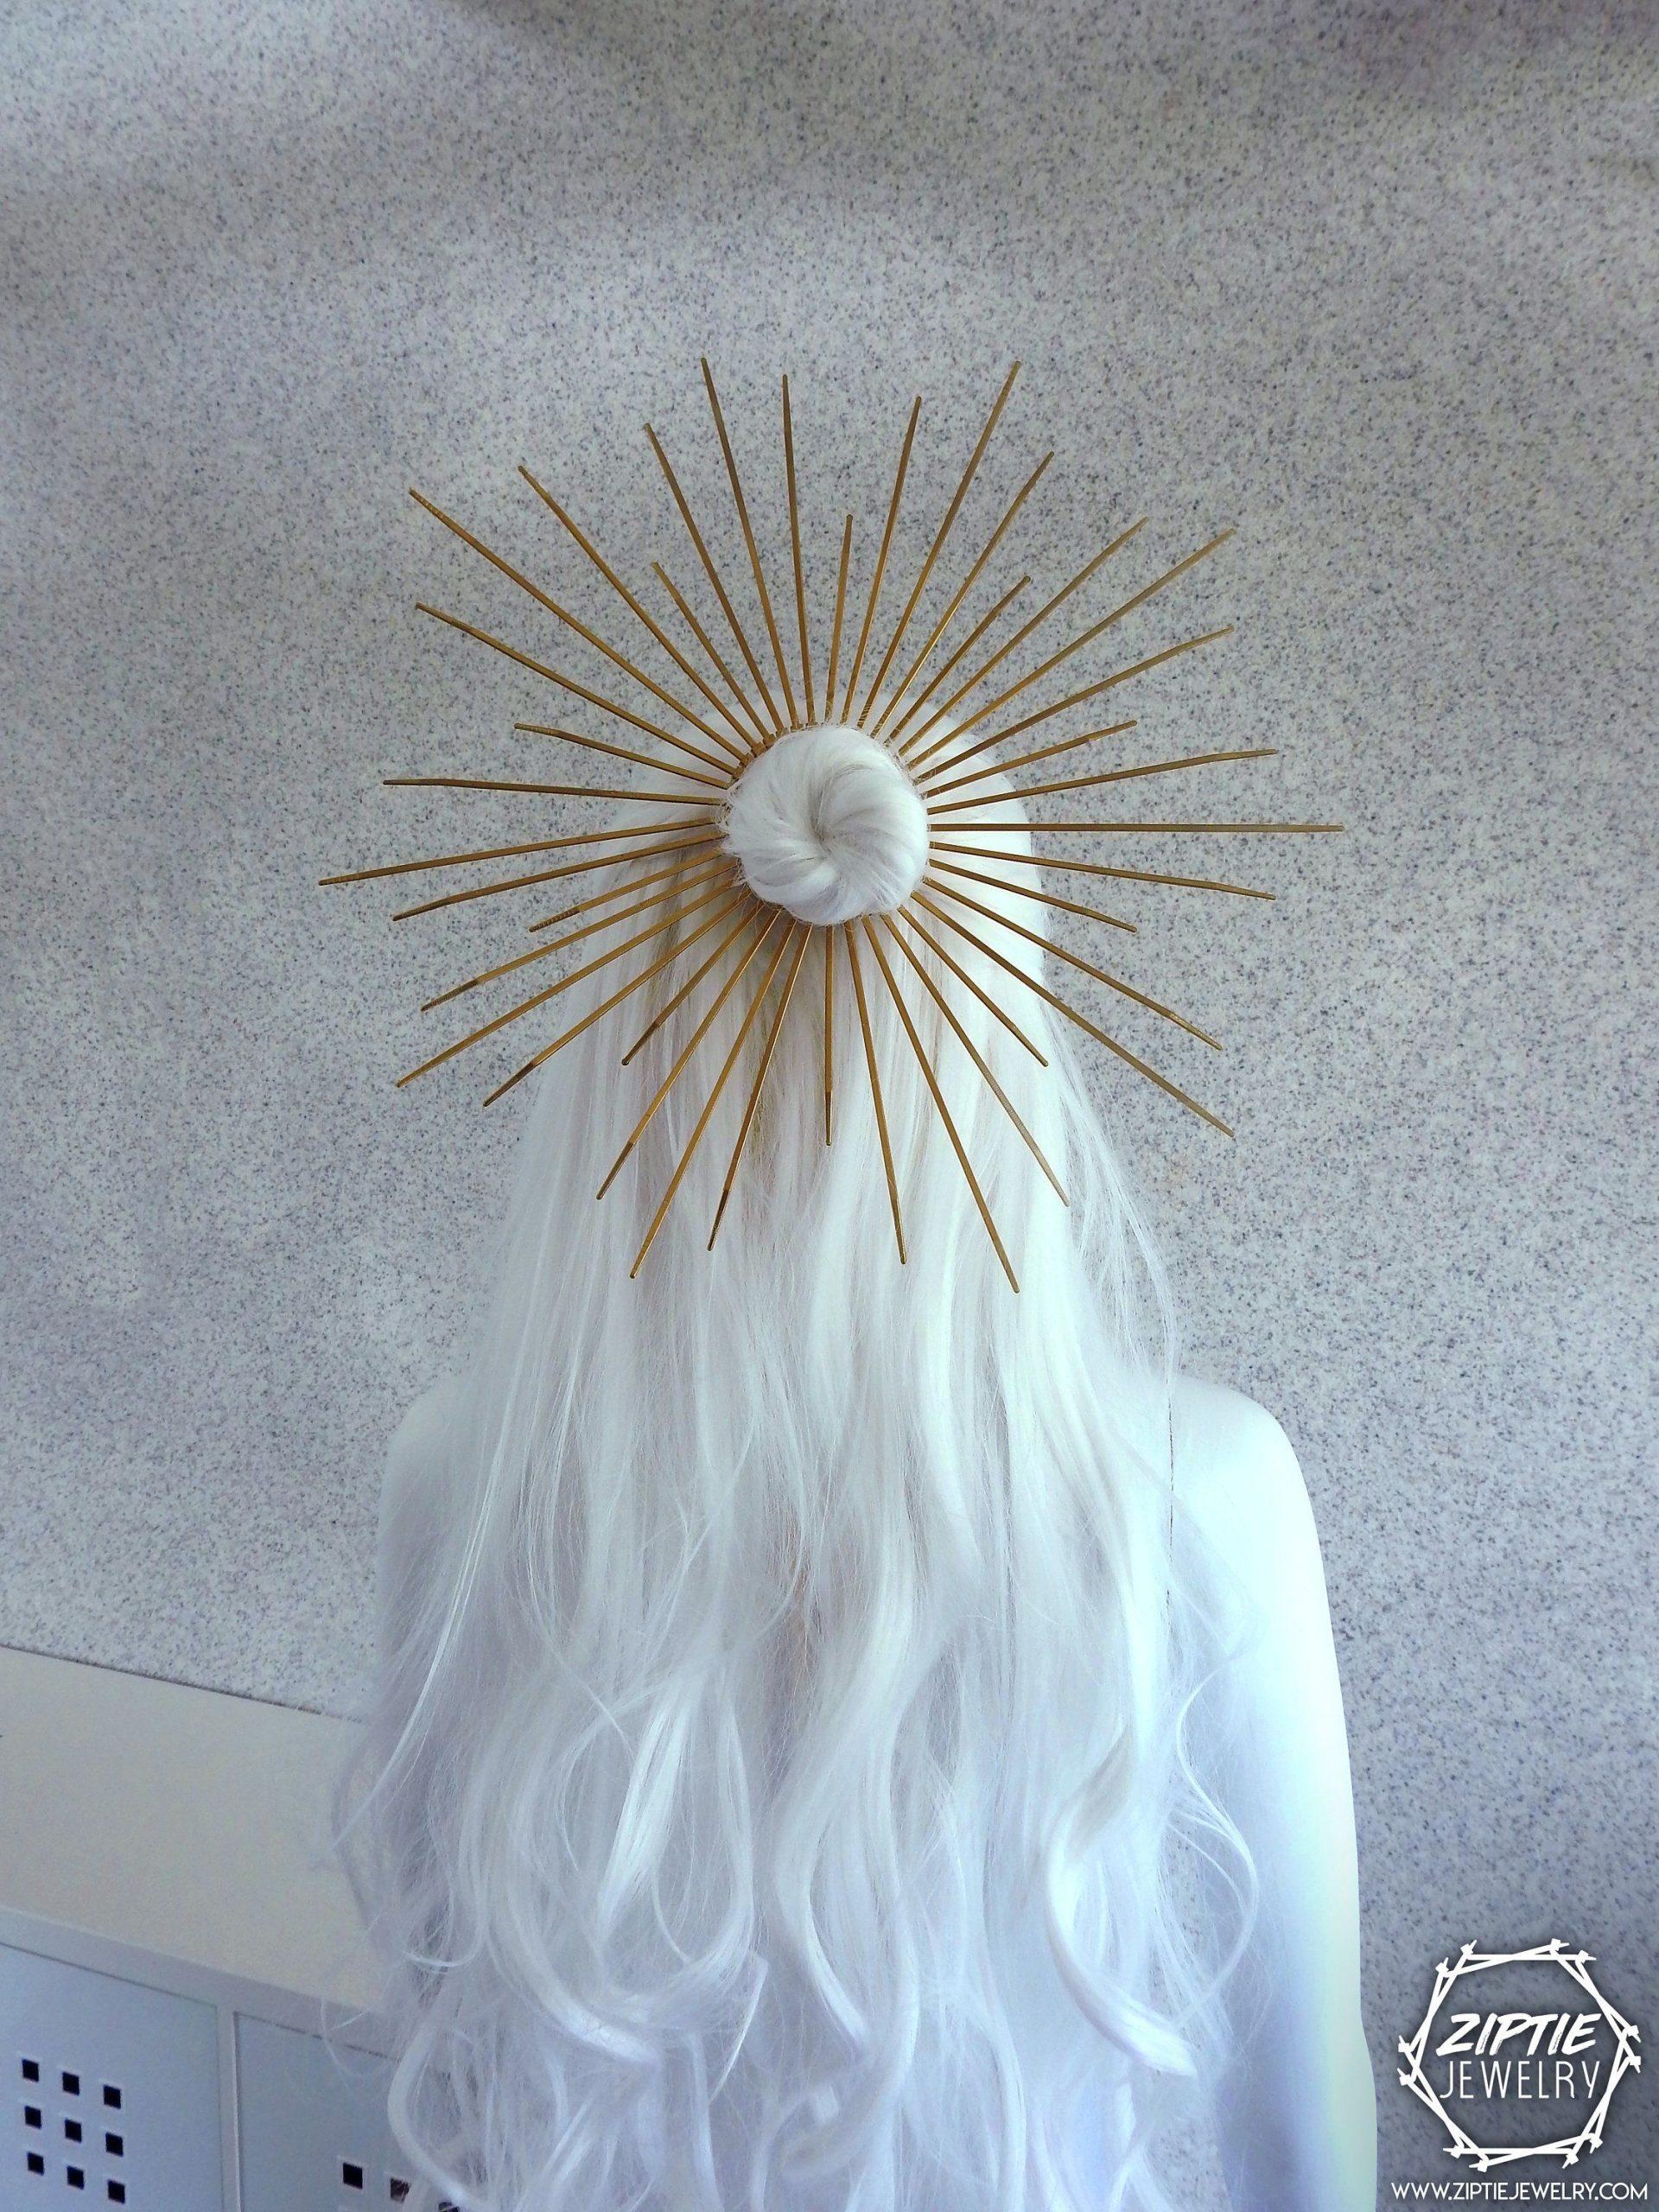 Halo Hair Bun Band / Gold Zip Tie Crown / Met Gala Crown / Saint Mary Crown / Zip Tie Headpiece / Silver Zip Tie Headdress